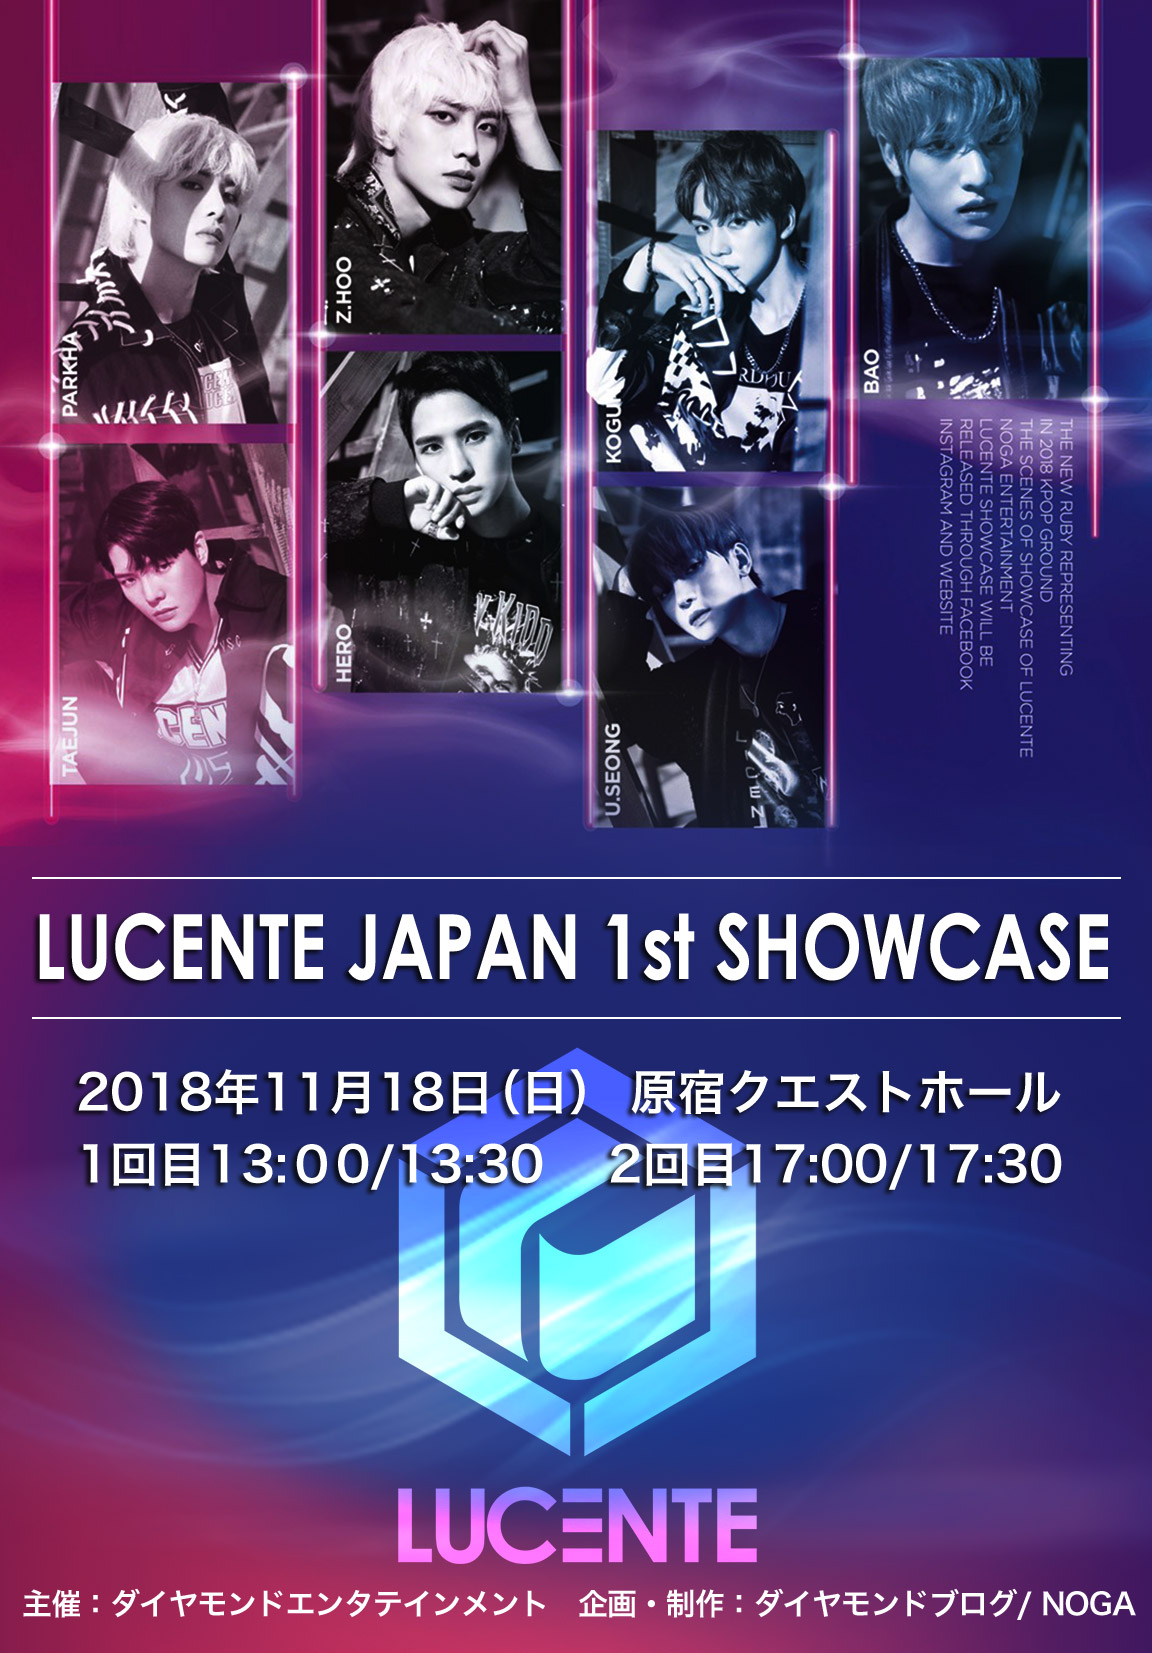 LUCENTE JAPAN 1st SHOWCASE